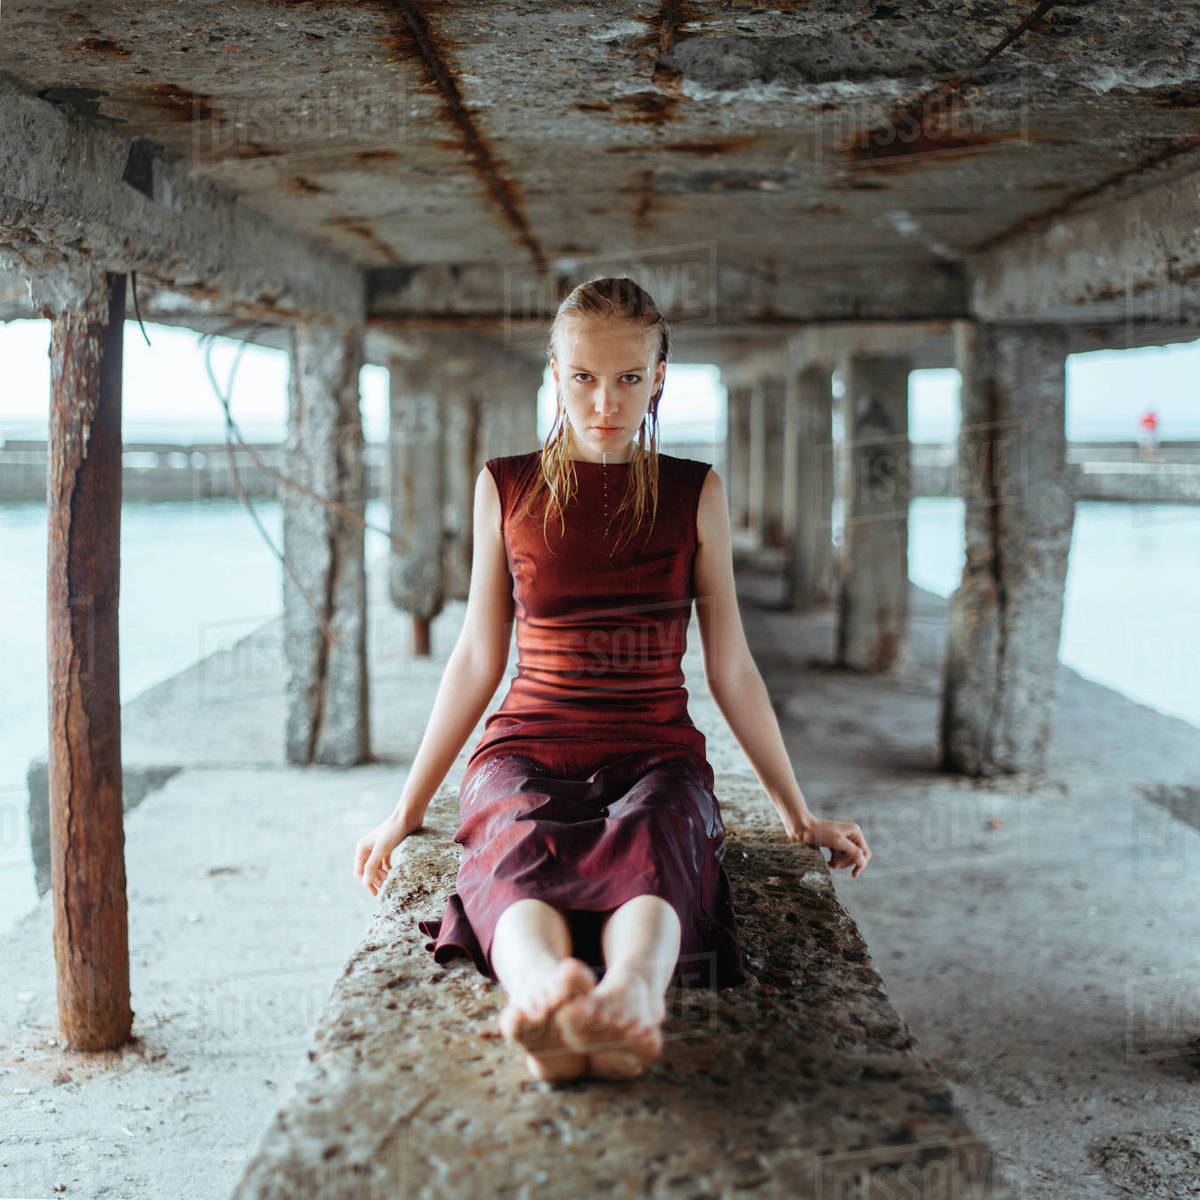 Caucasian girl wearing wet dress sitting underneath dock